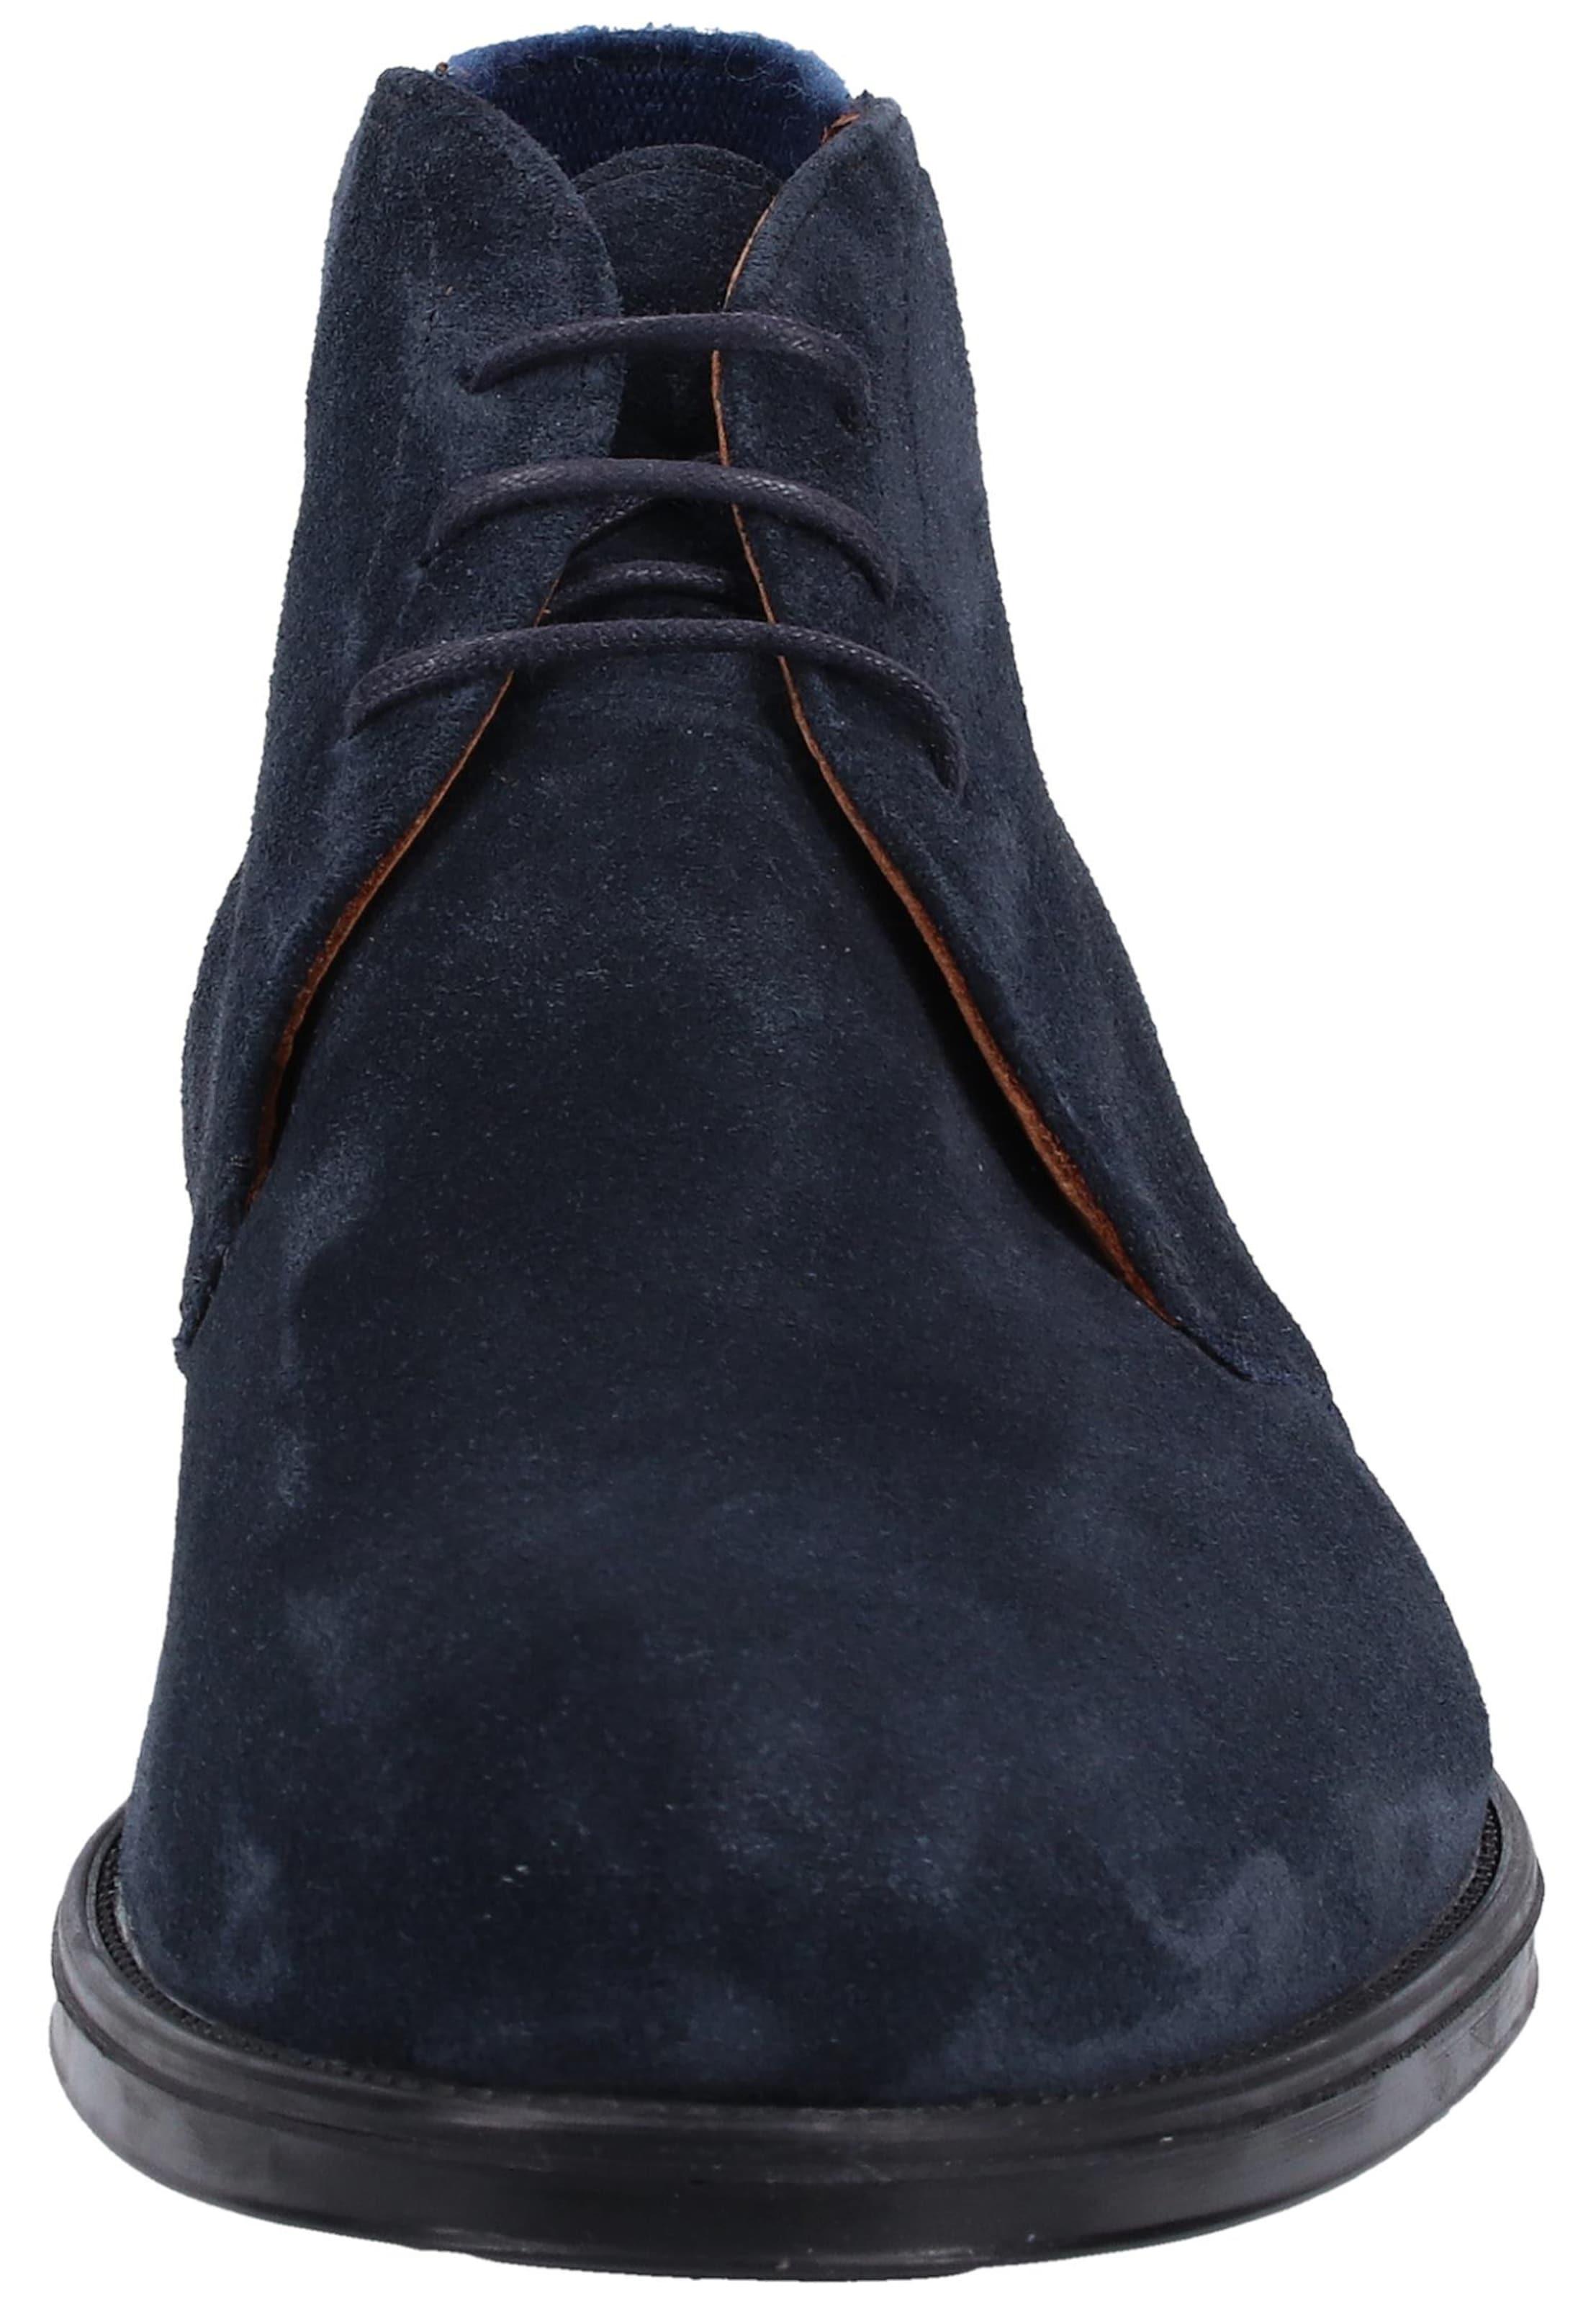 Kobaltblau Lloyd 'patriot' Lloyd Stiefelette In Stiefelette wPk8On0